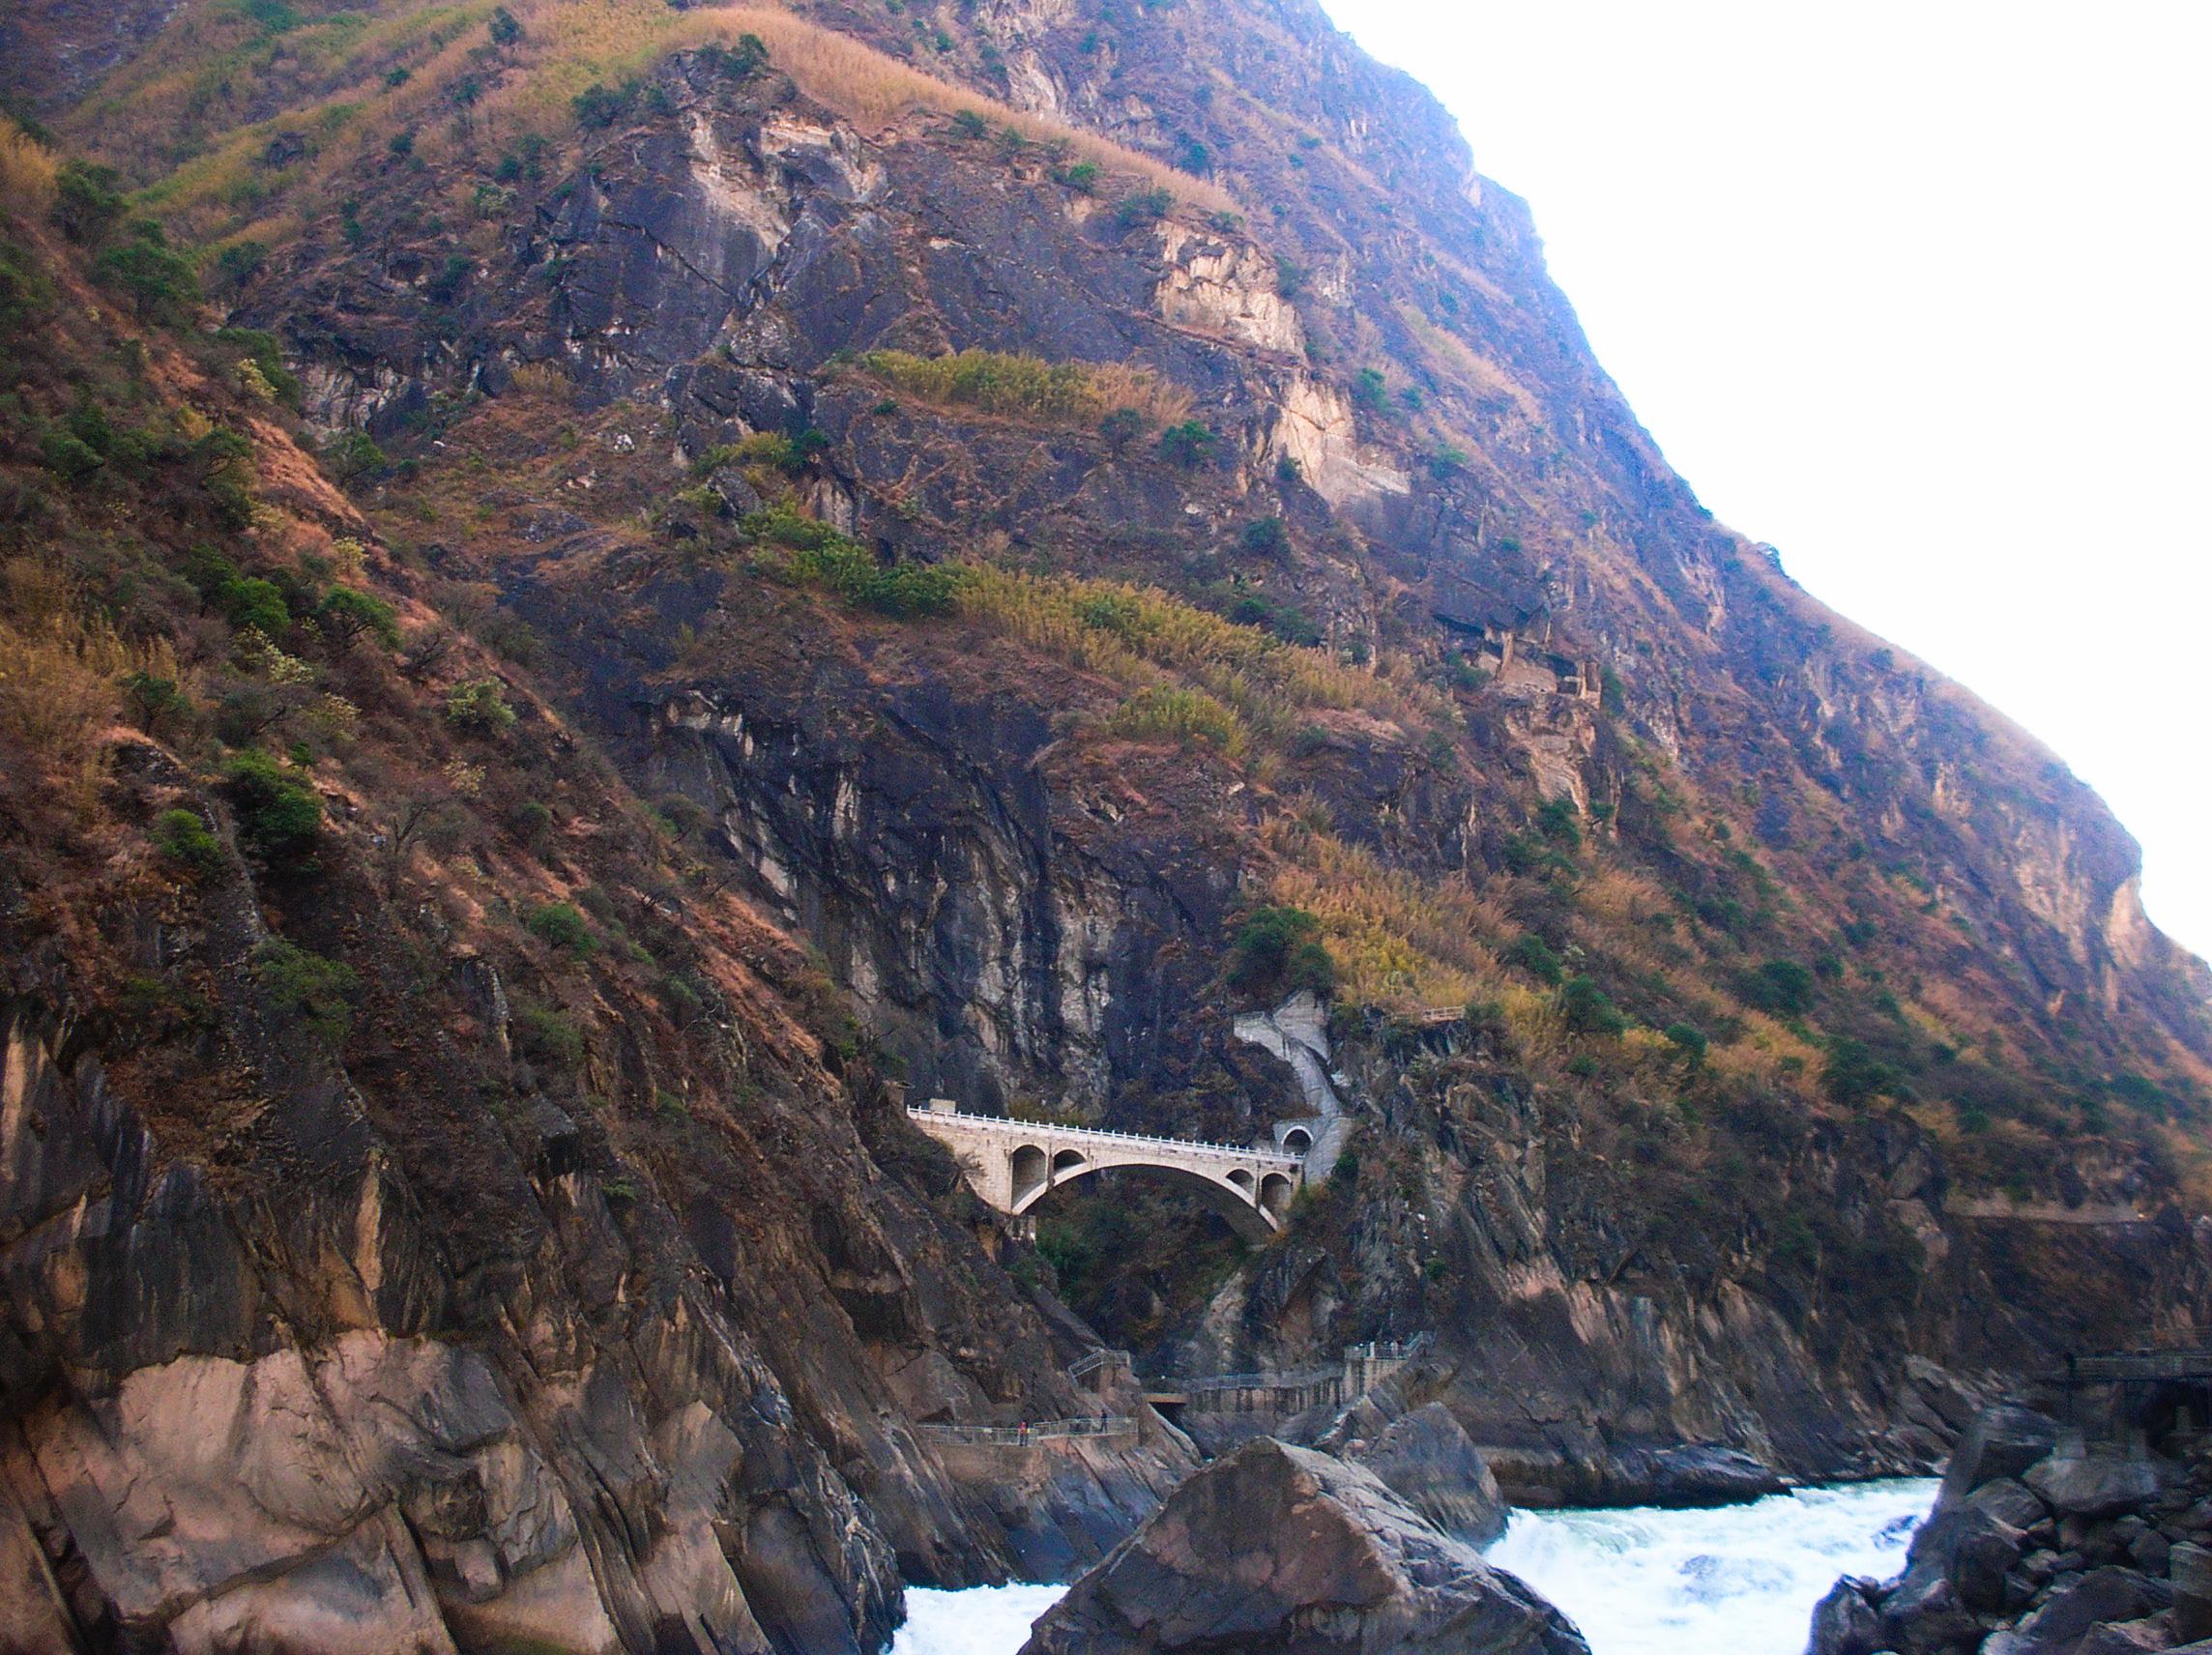 Explore Lonavala: The Jewel Of The Sahyadri Mountains 1